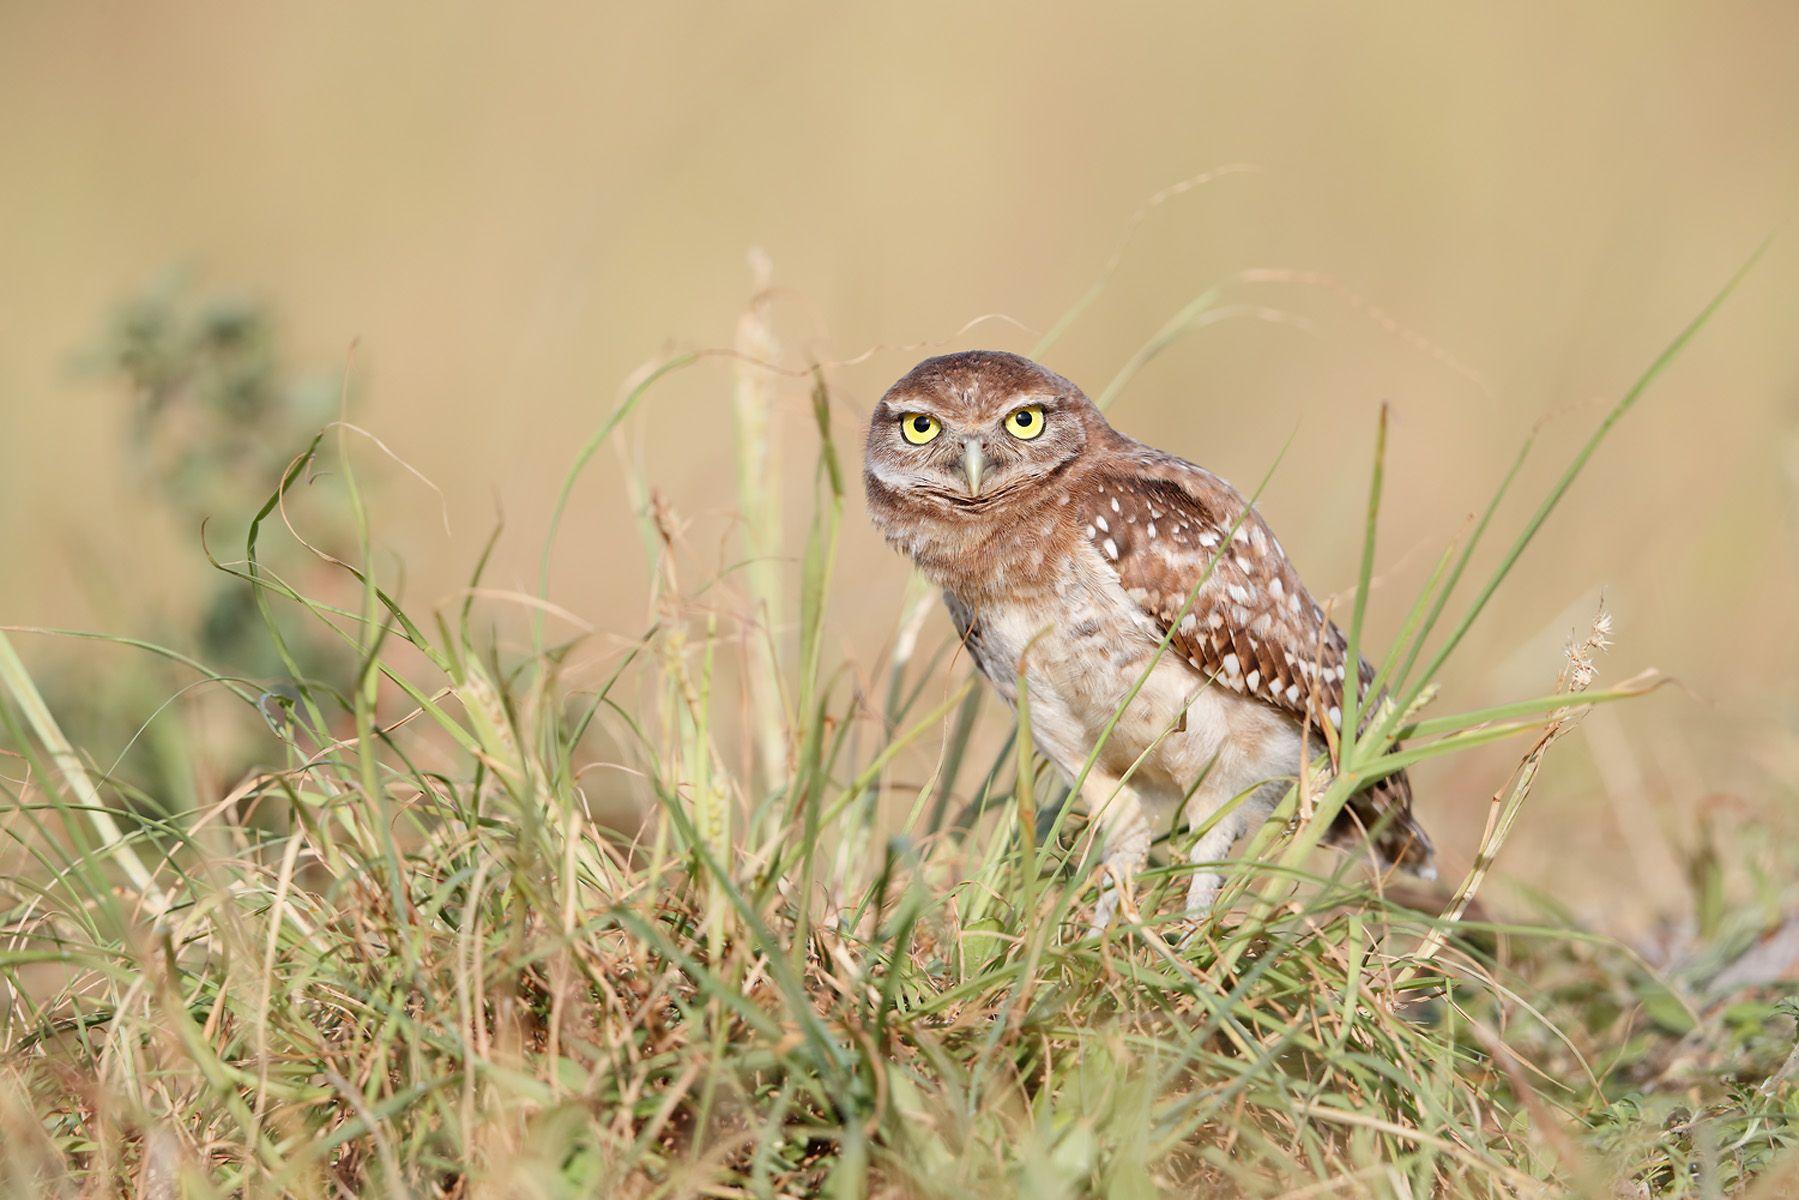 Burrowing owl looking curious_A3I0577-Boca Raton Airport, FL, USA.jpg